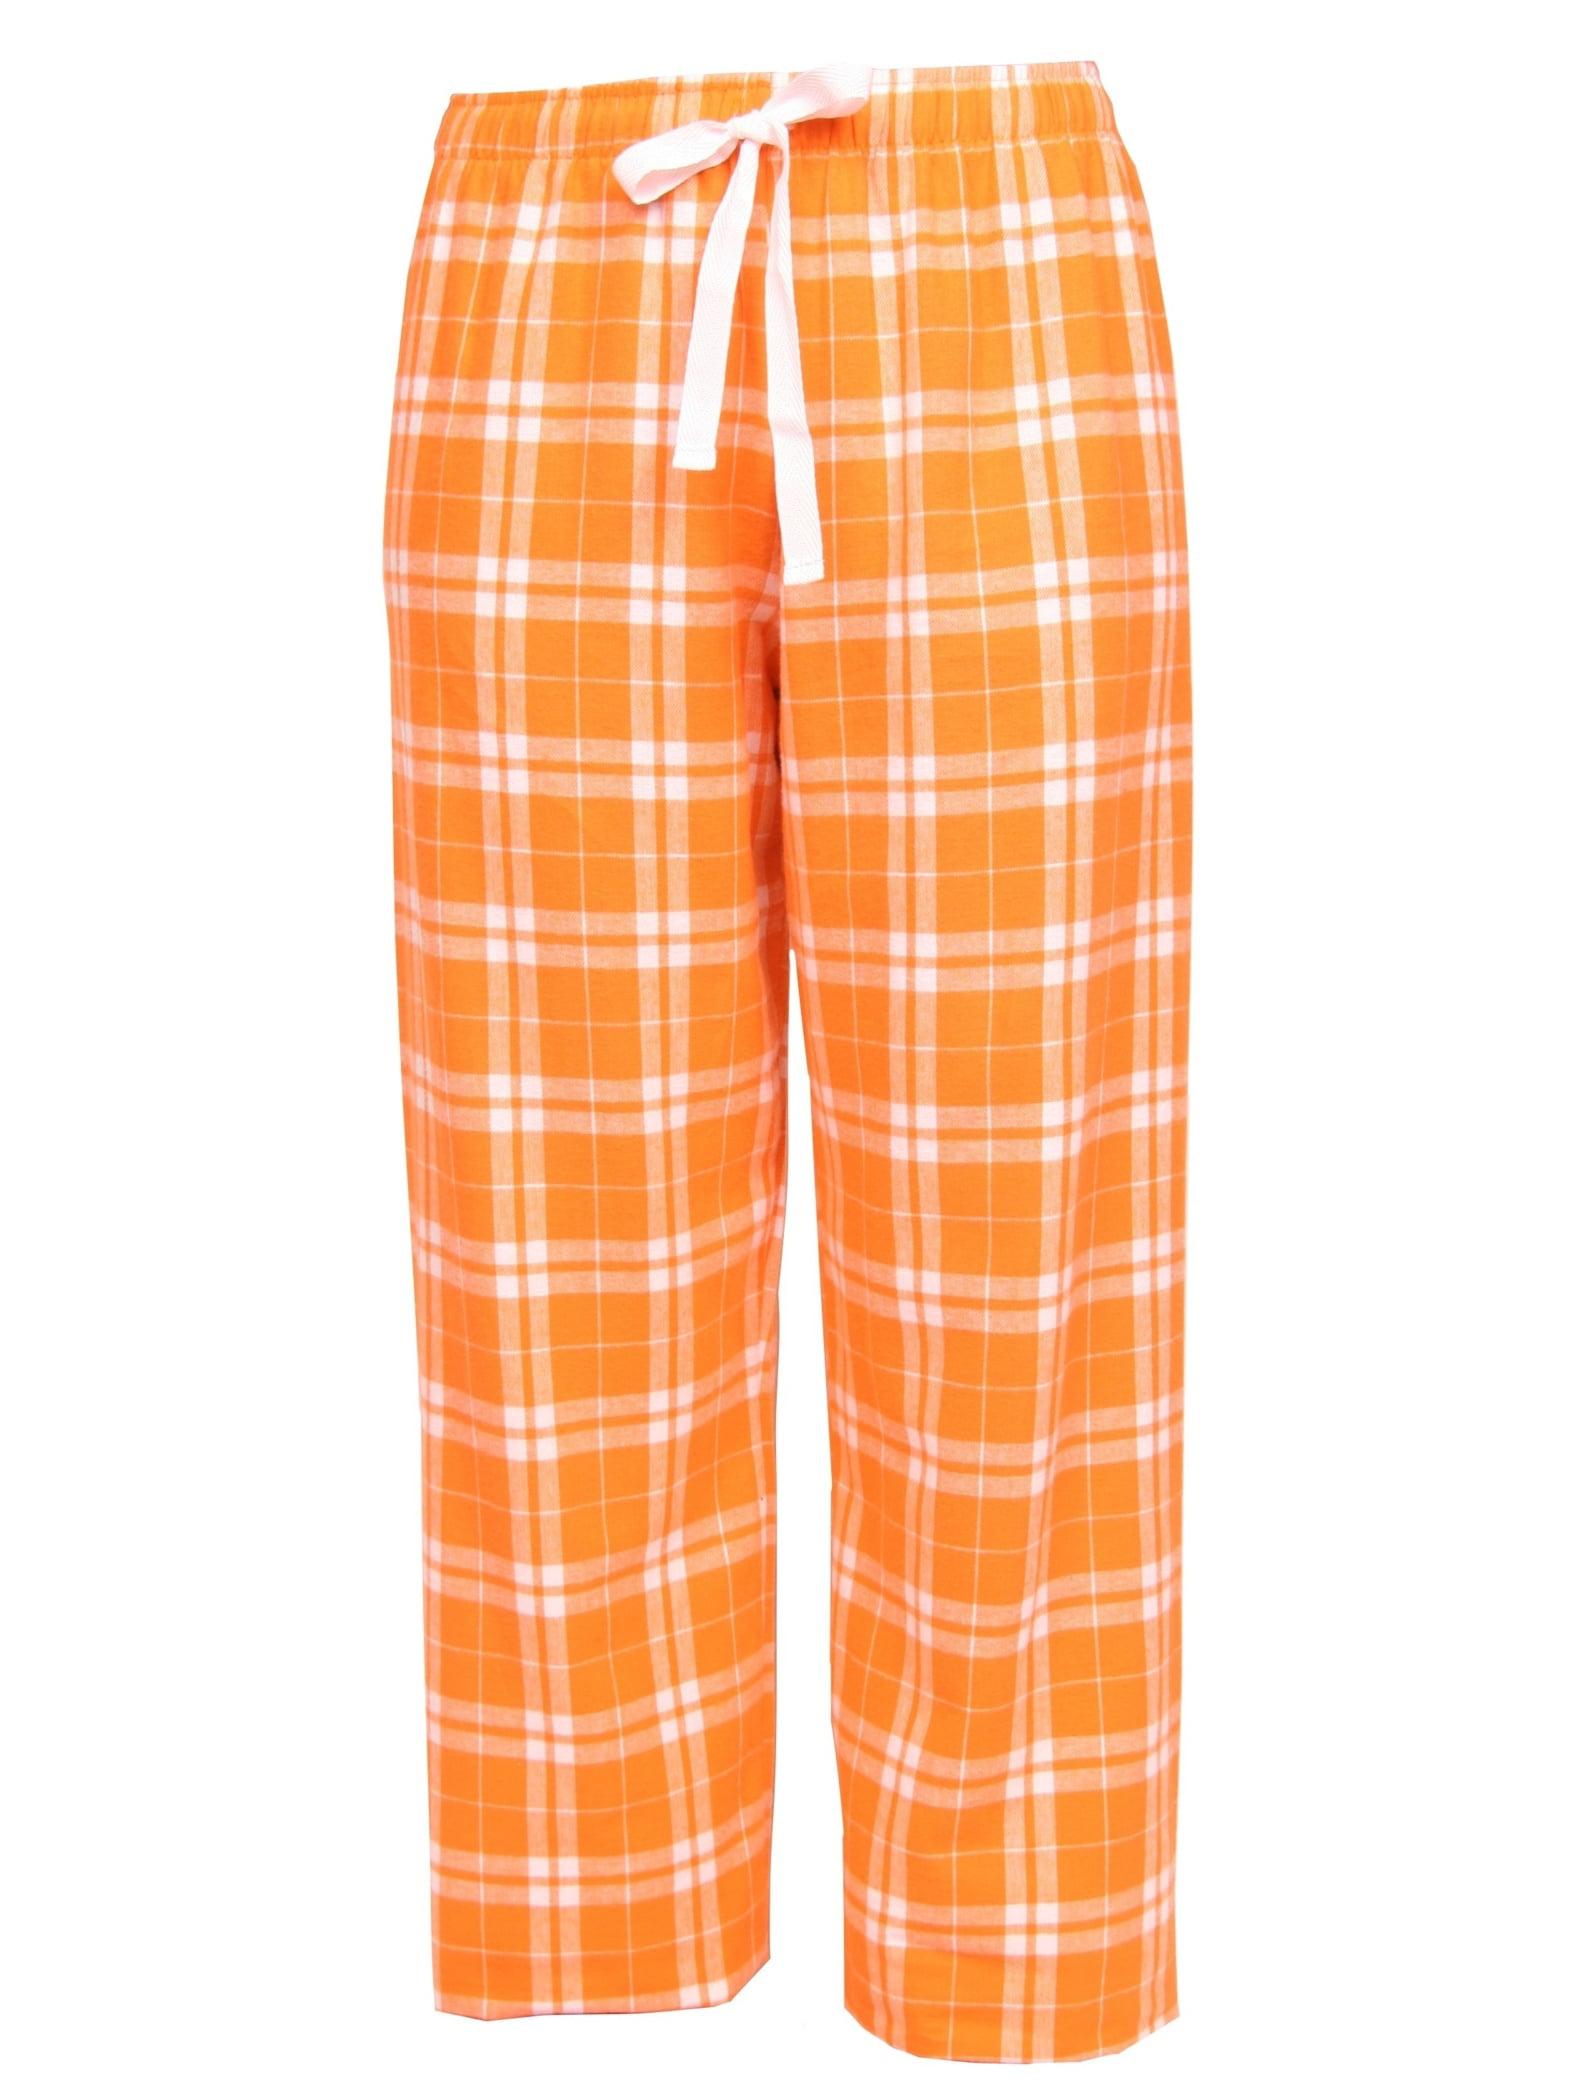 Hometown Clothing BUNDLE Boys Flannel Pant /& 10/% OFF coupon, Orange//Black-M